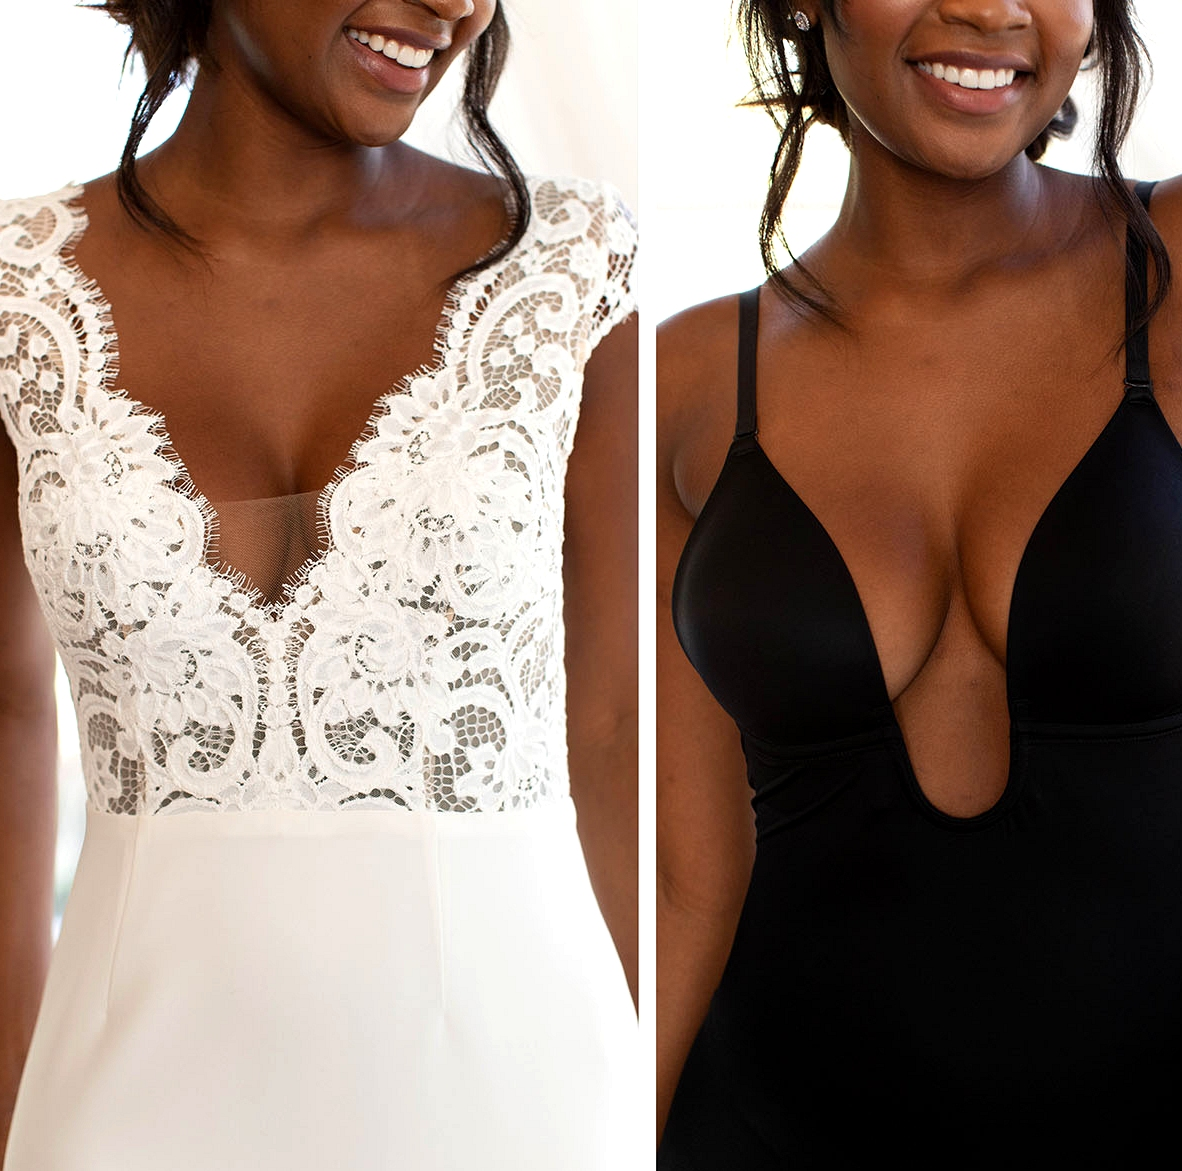 Spanx Wedding Dress Undergarment